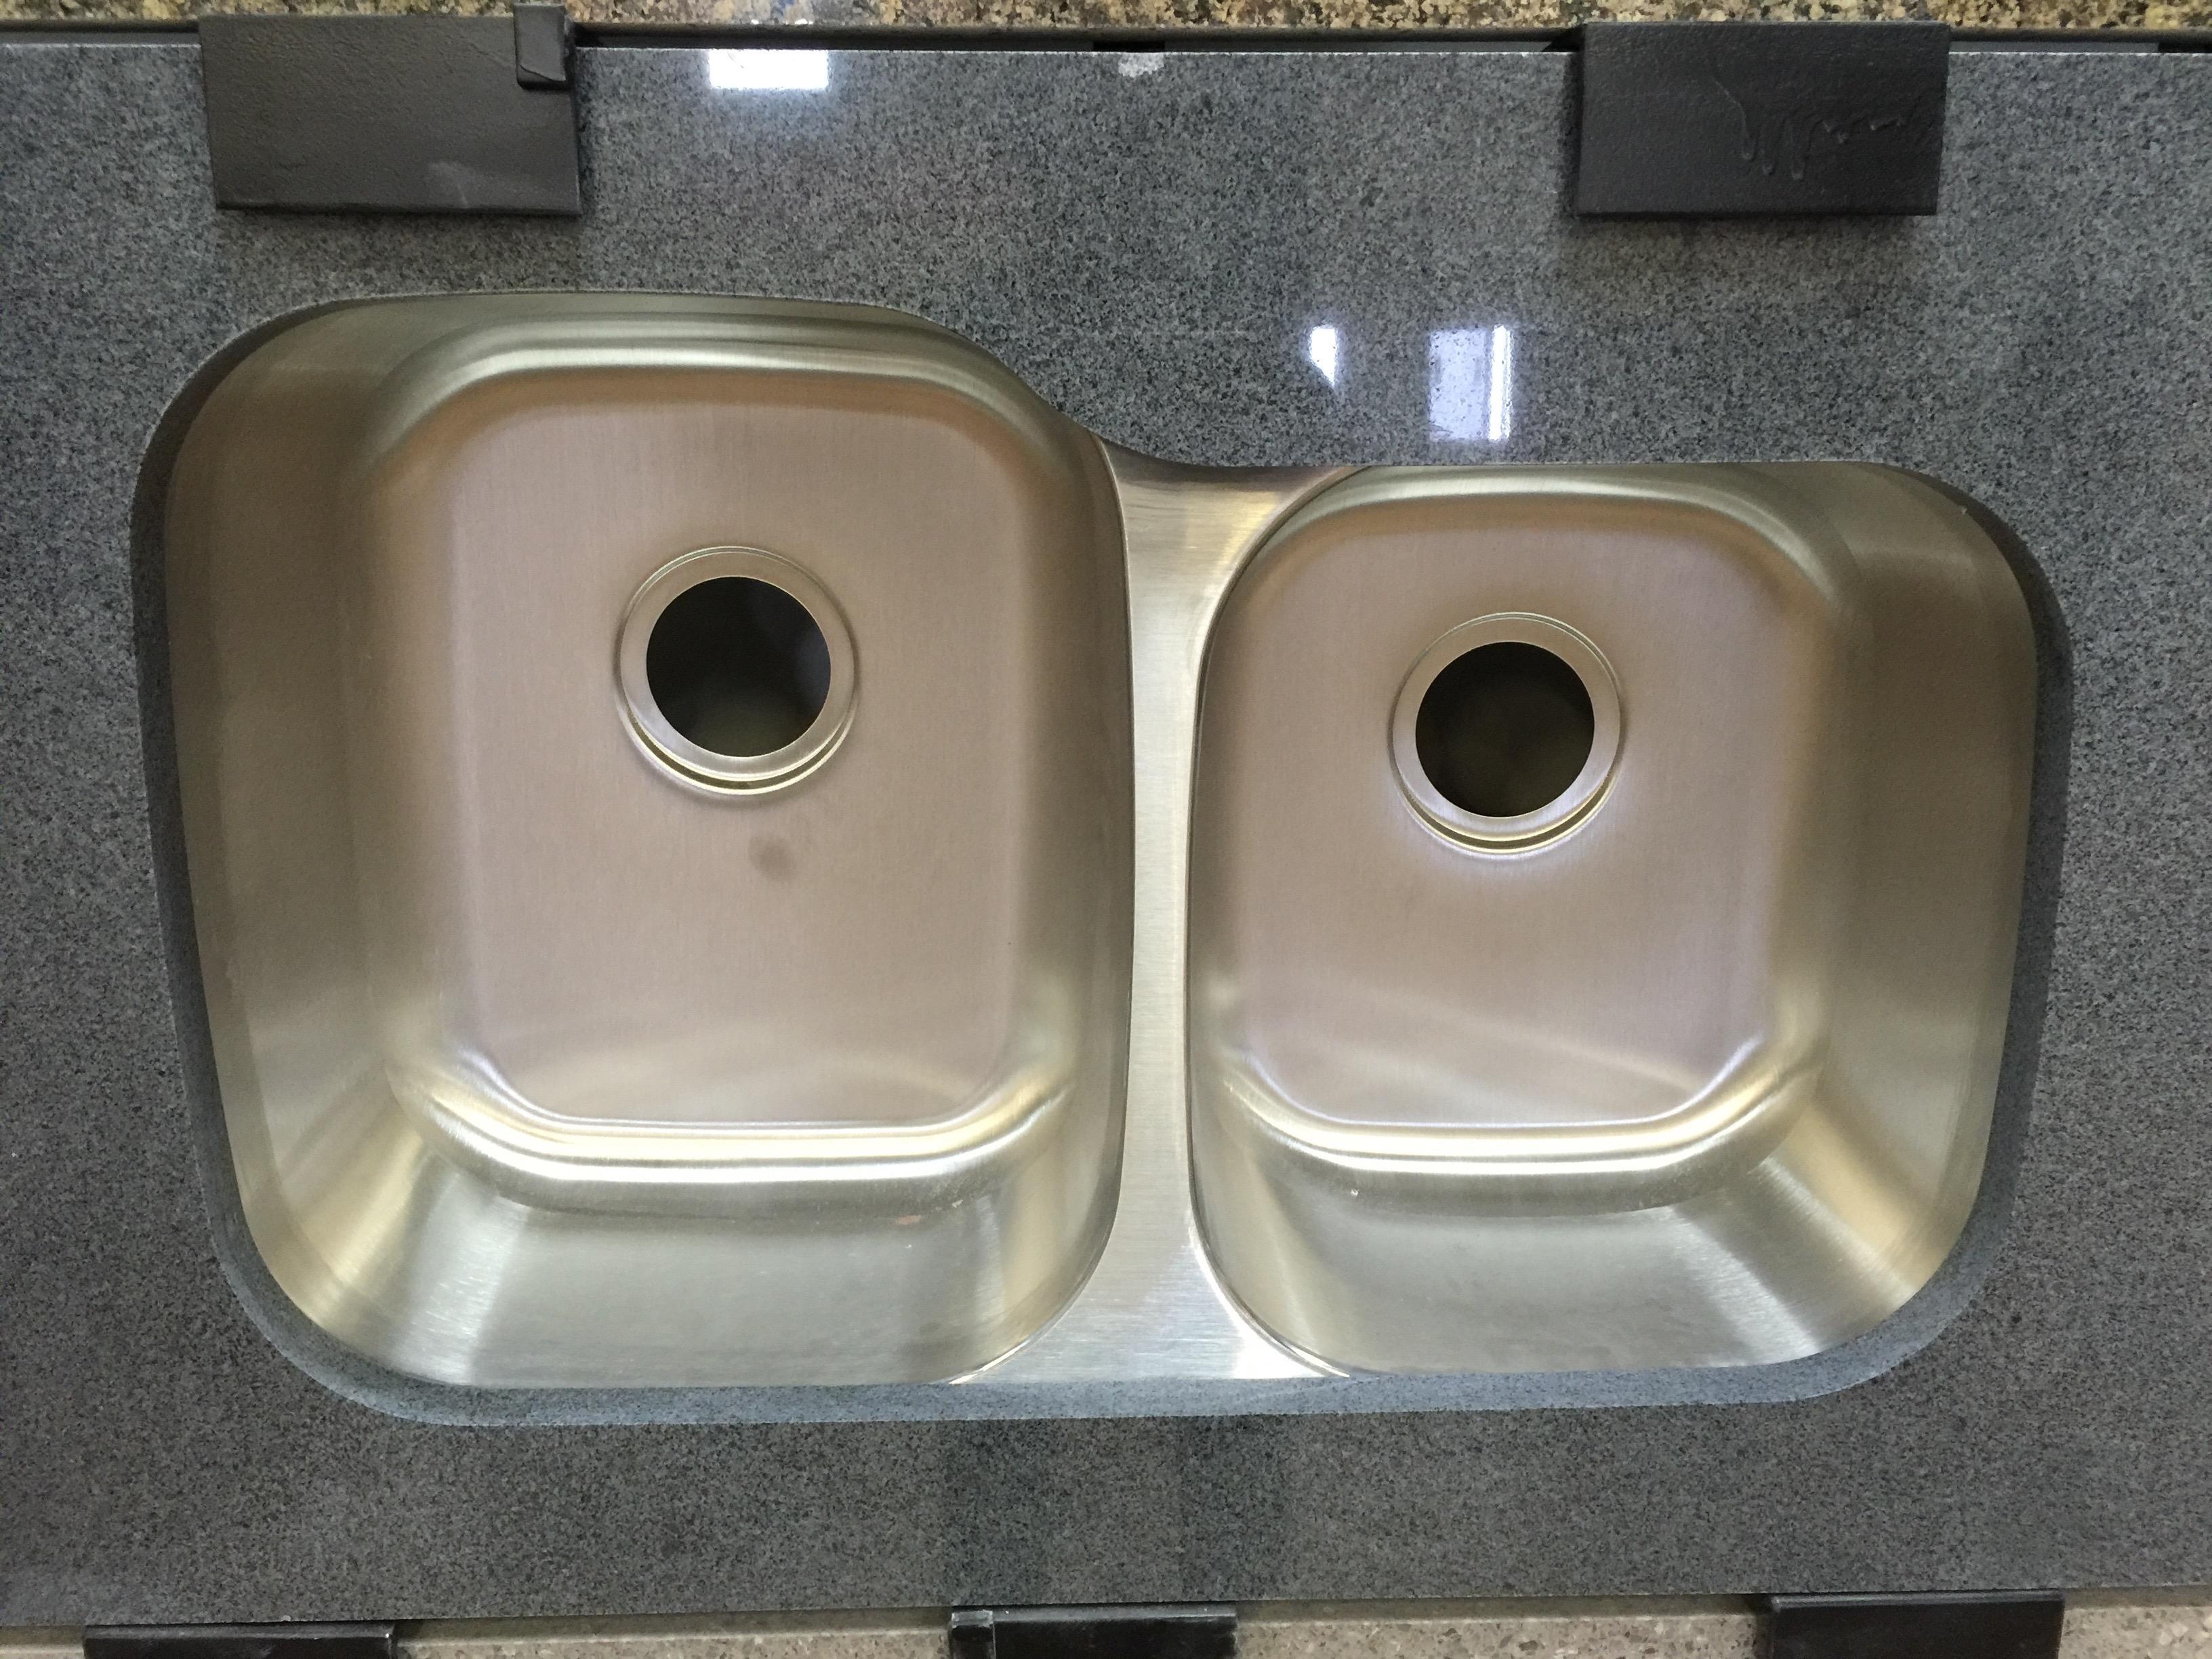 Ideas, artisan faucets and sinks artisan faucets and sinks bathroom coolest sinks artisan sinks unusual bathroom sinks 3264 x 2448  .